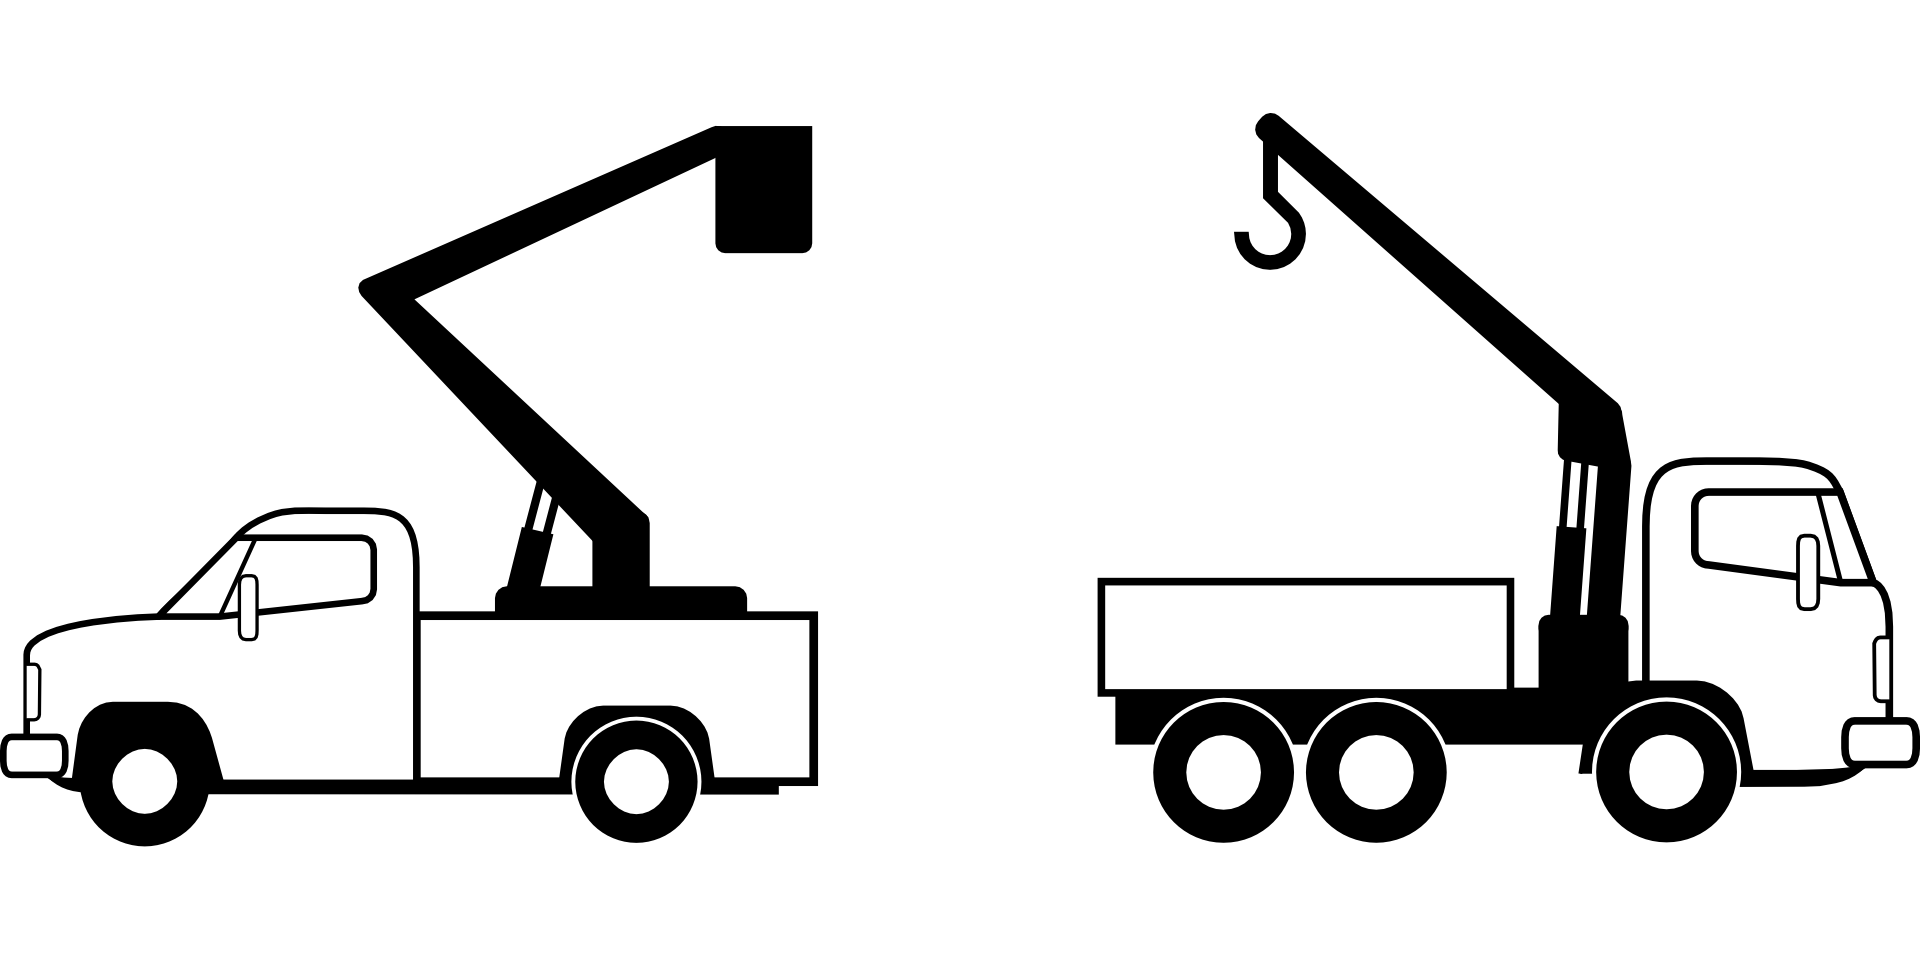 Crane clipart work vehicle. Mobile truck clip art